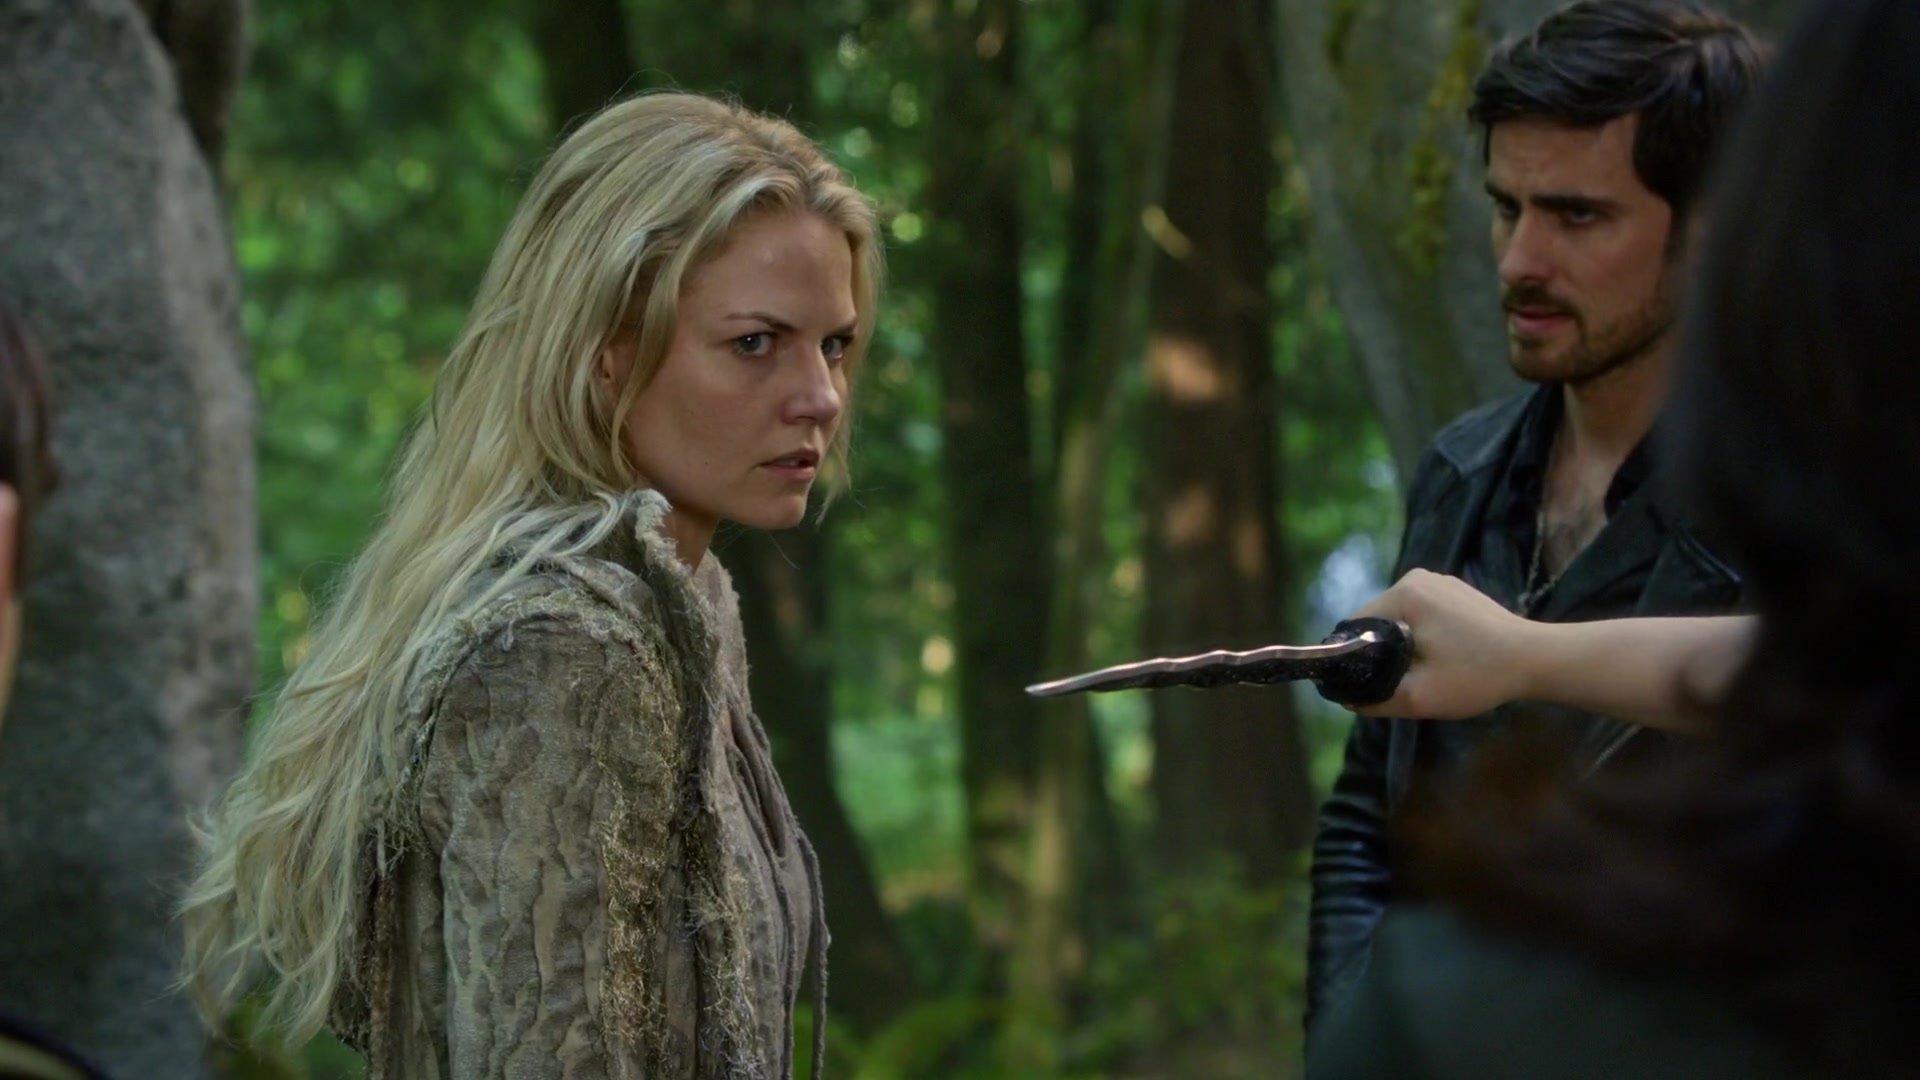 Emma Swan (Jennifer Morrison) battles within herself the Dark One Curse.